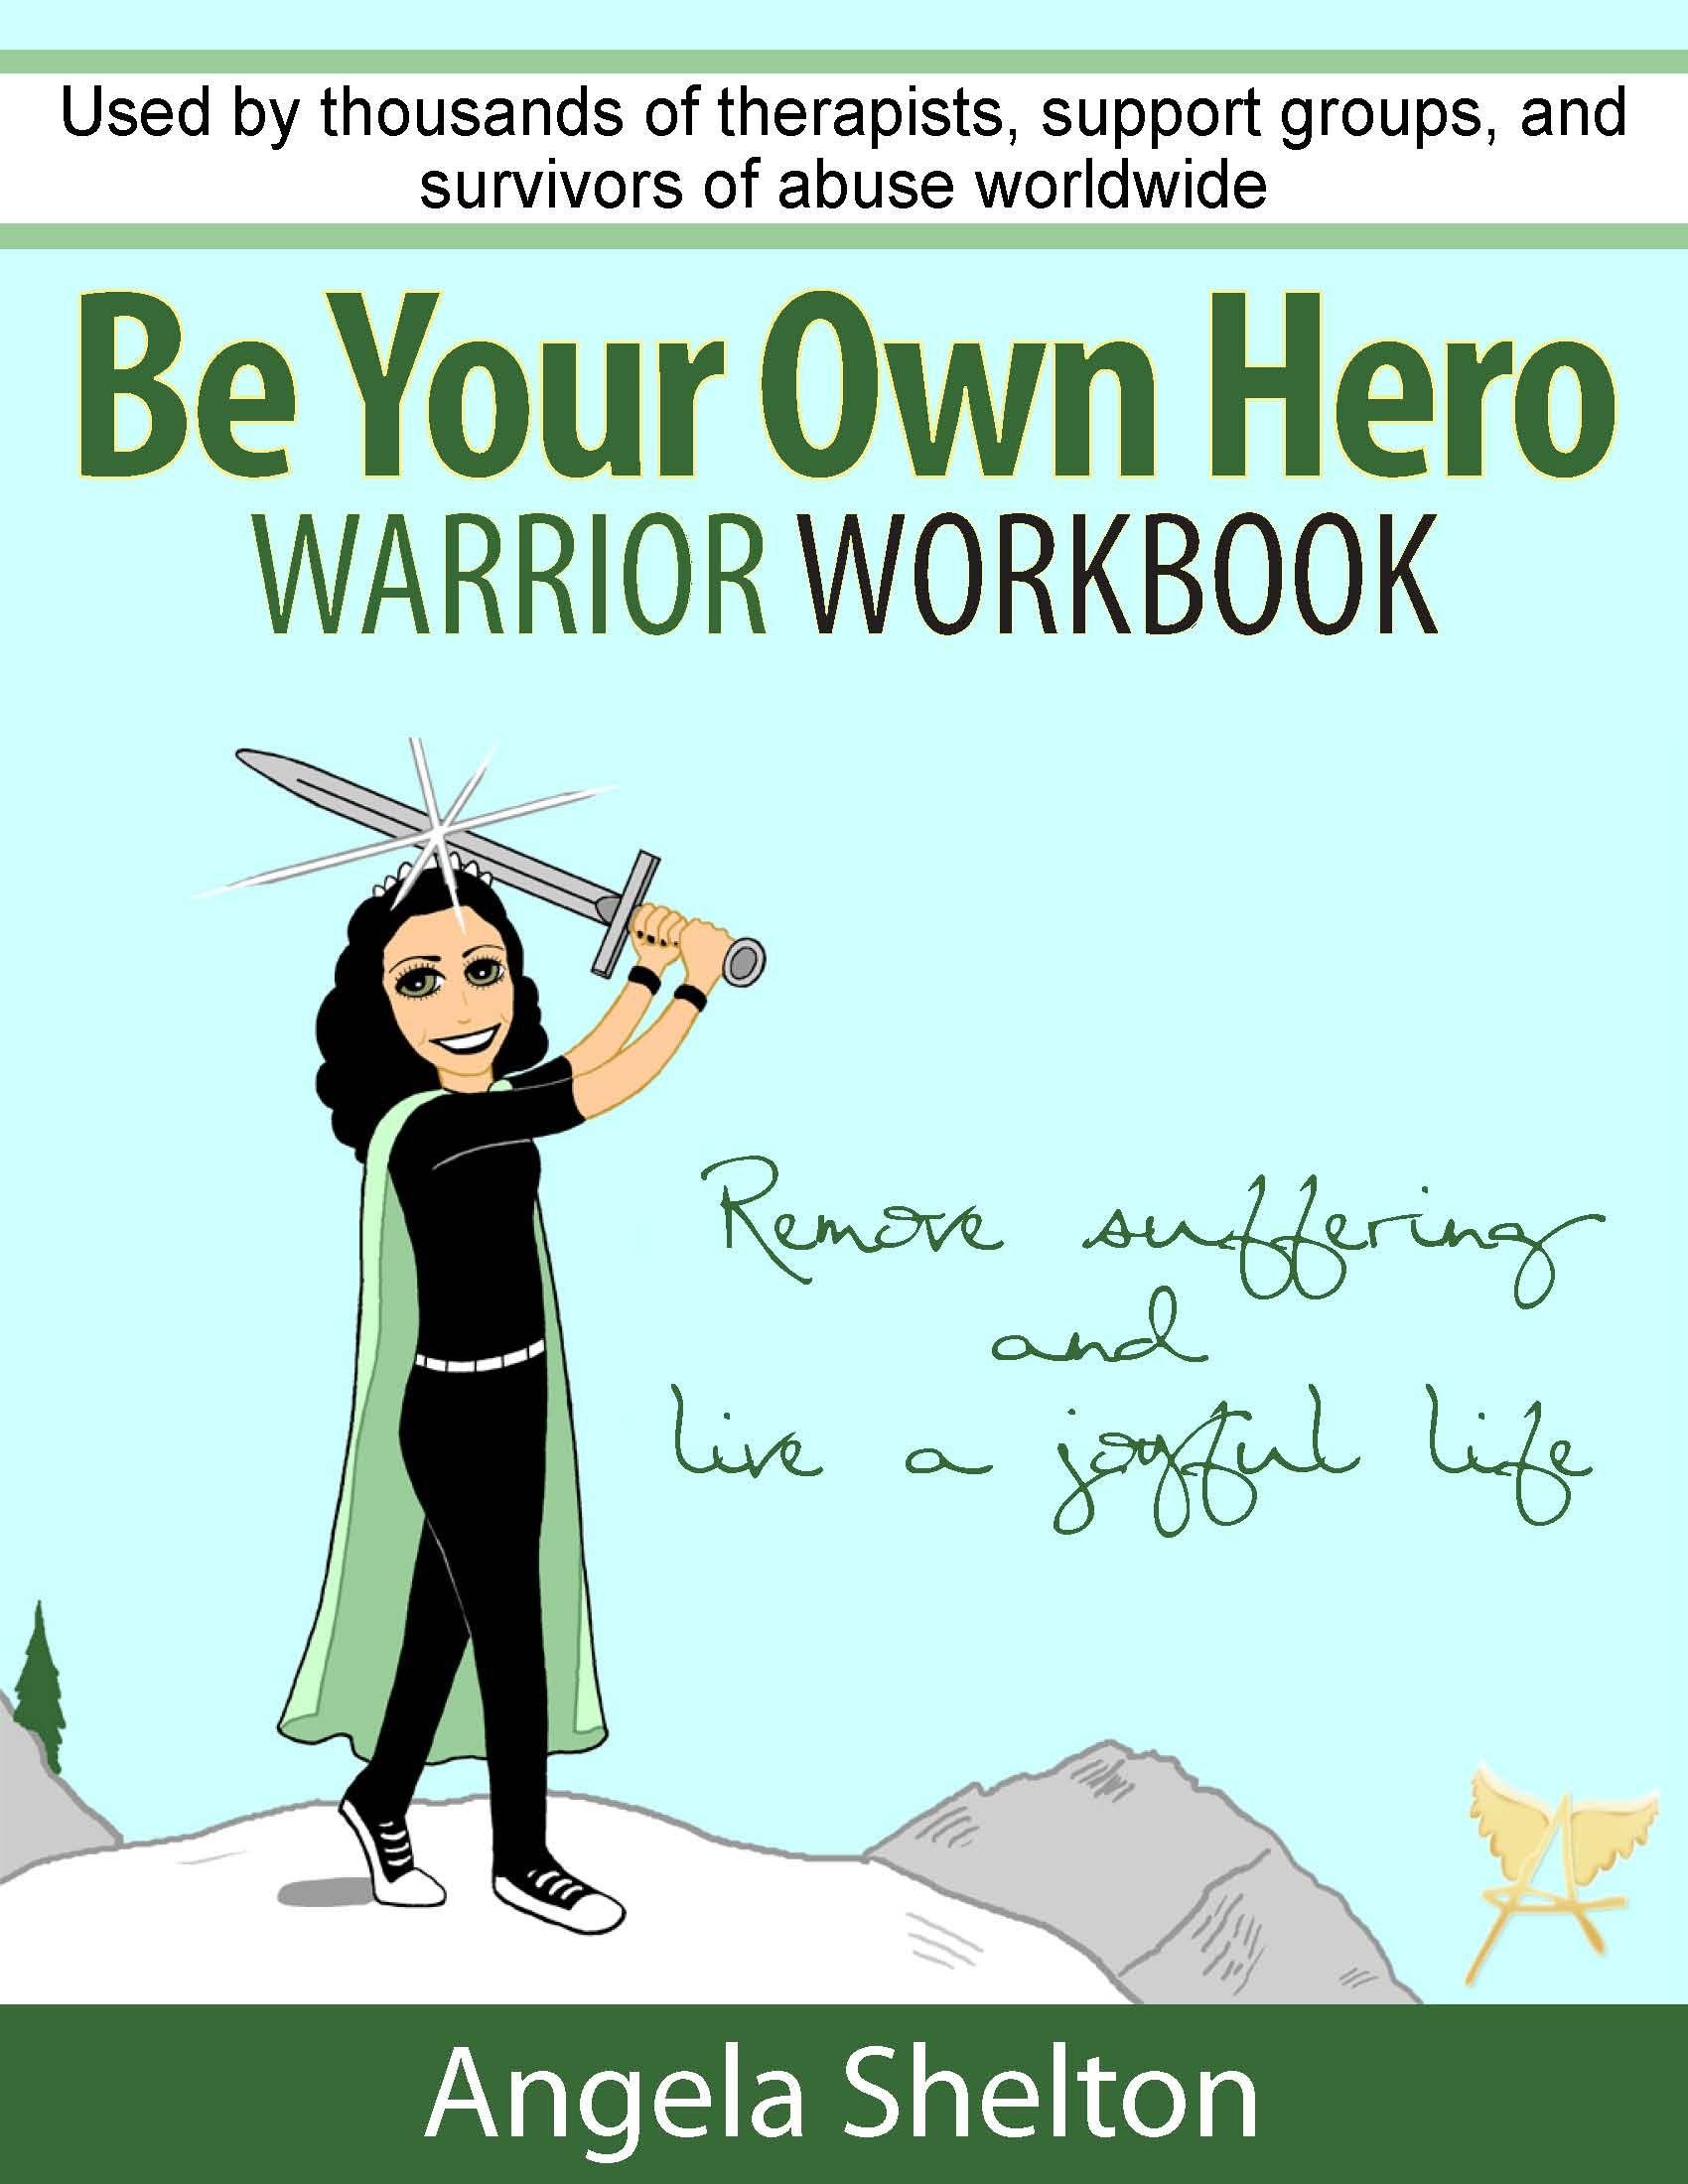 Be Your Own Hero Workbook